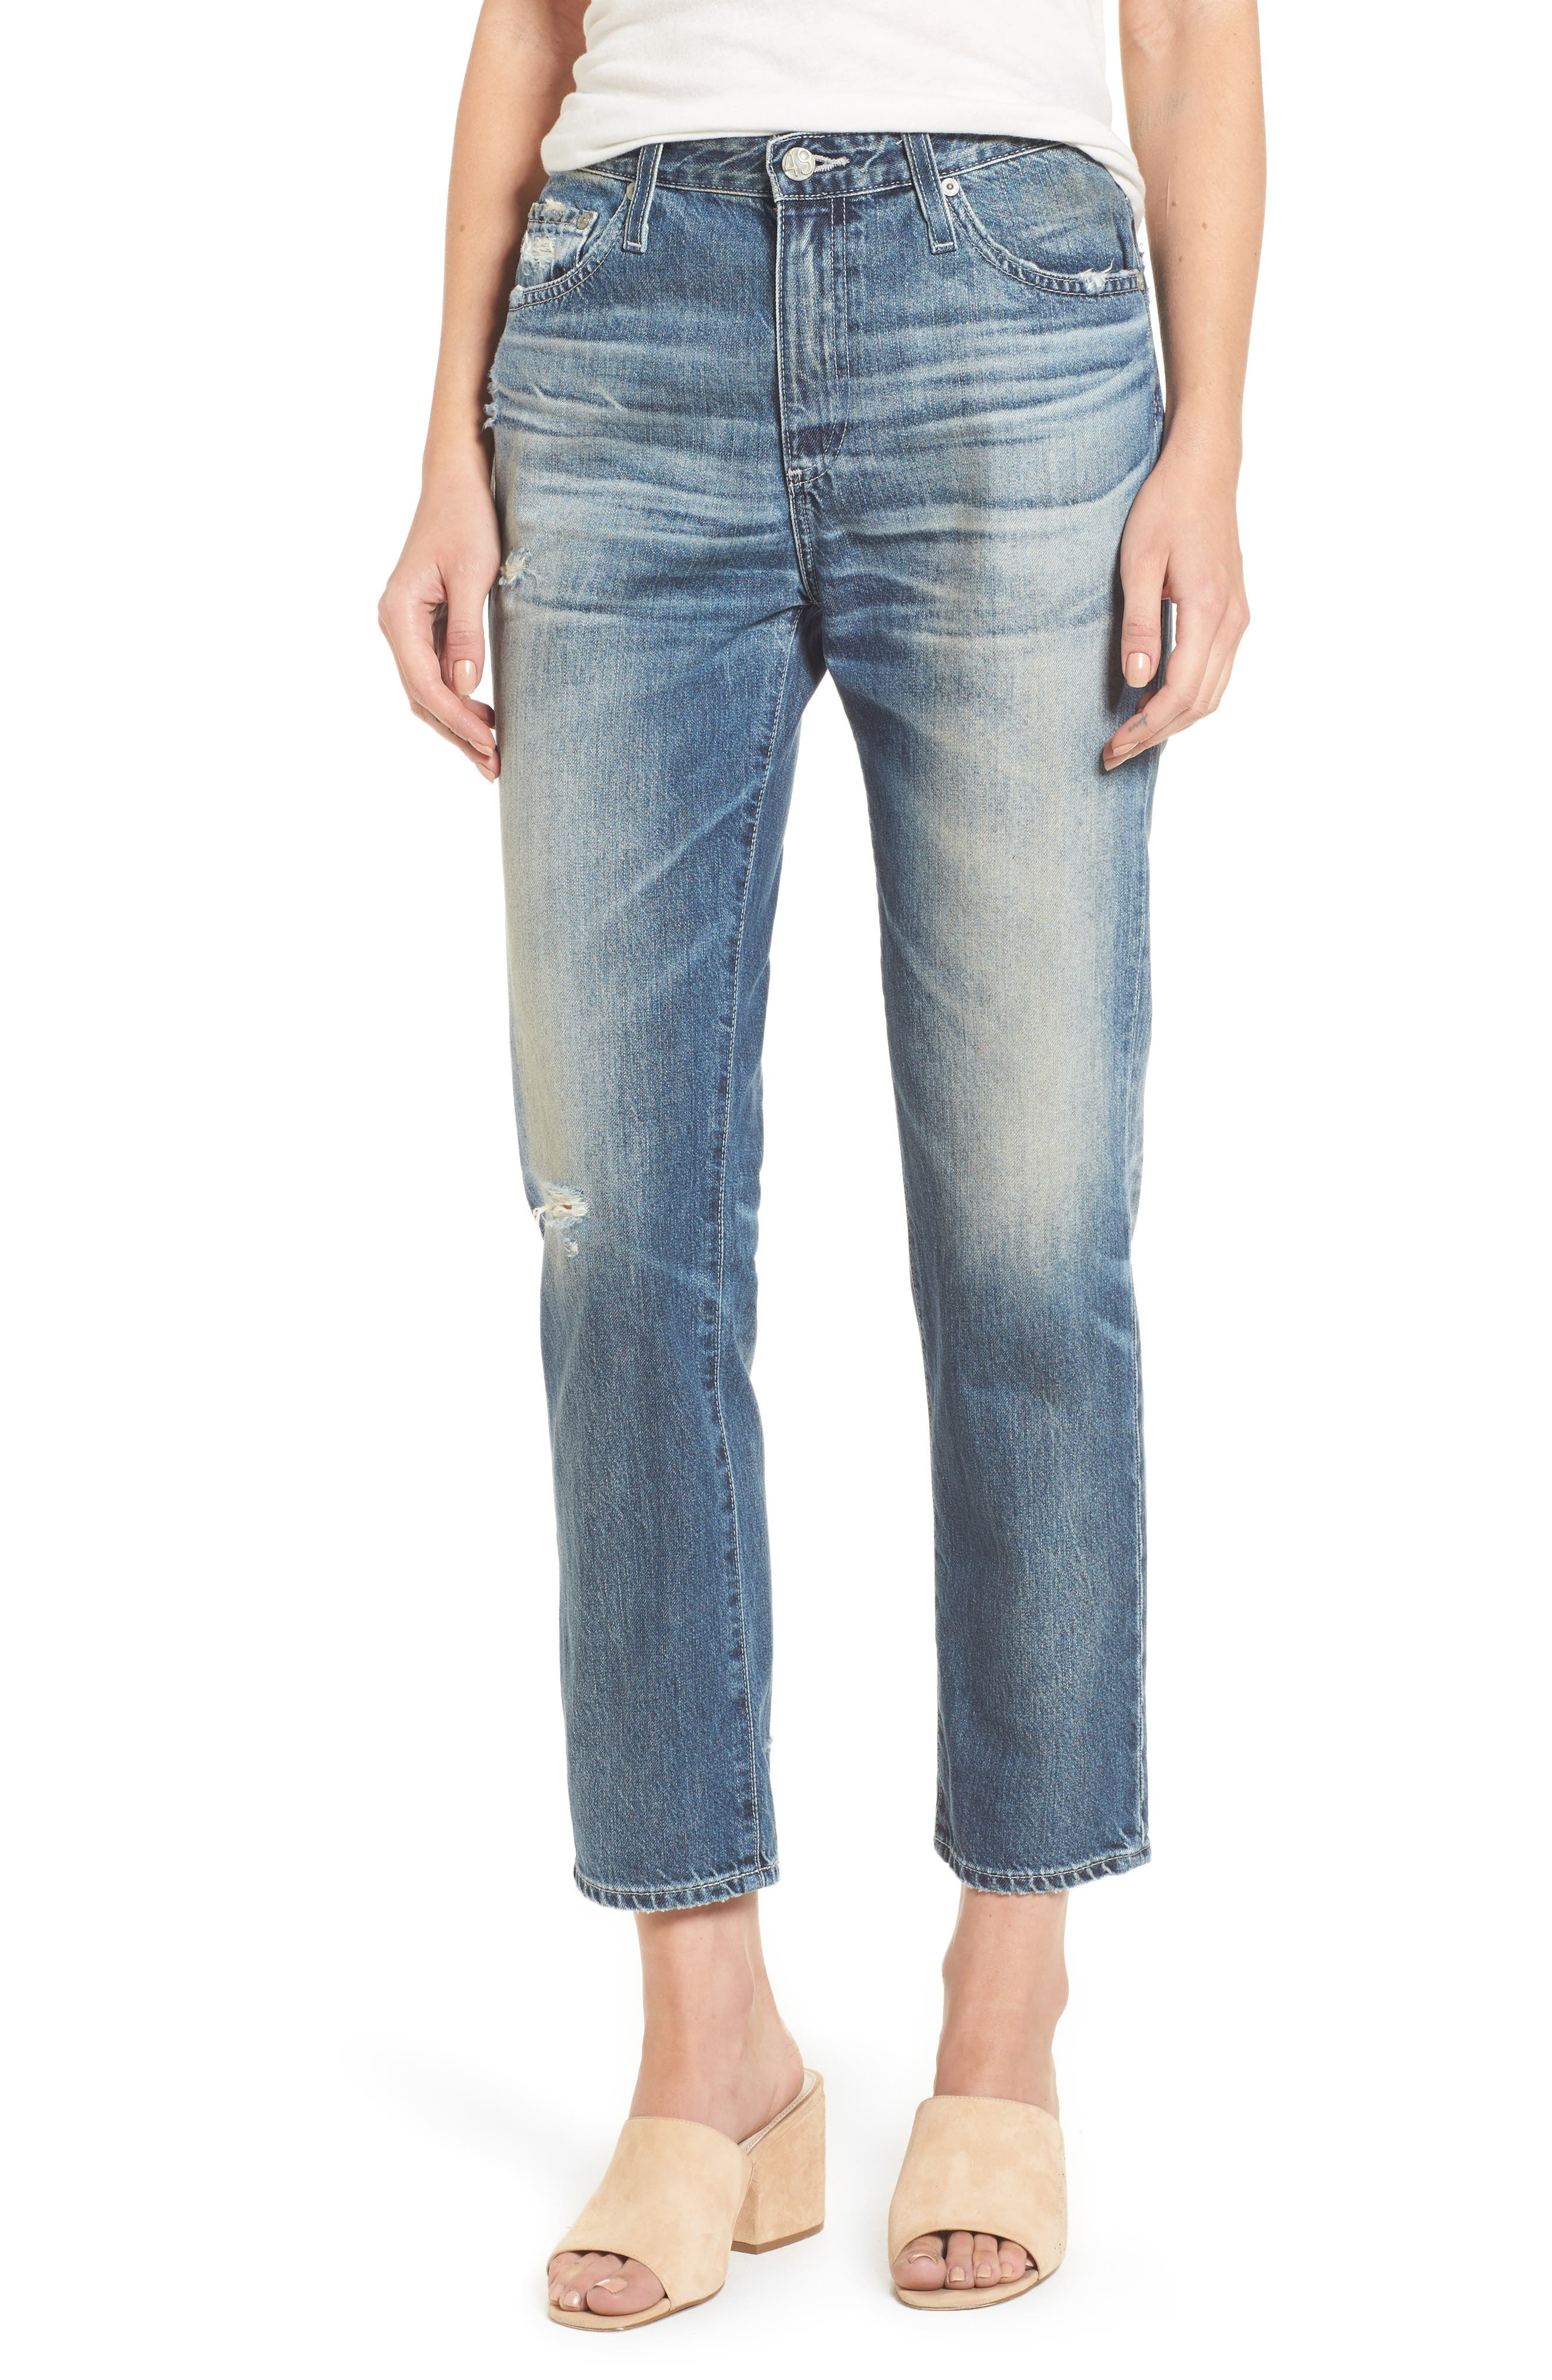 Isabelle High Waist Straight Leg Crop Jeans,                         Main,                         color, 23 Years Wind Worn